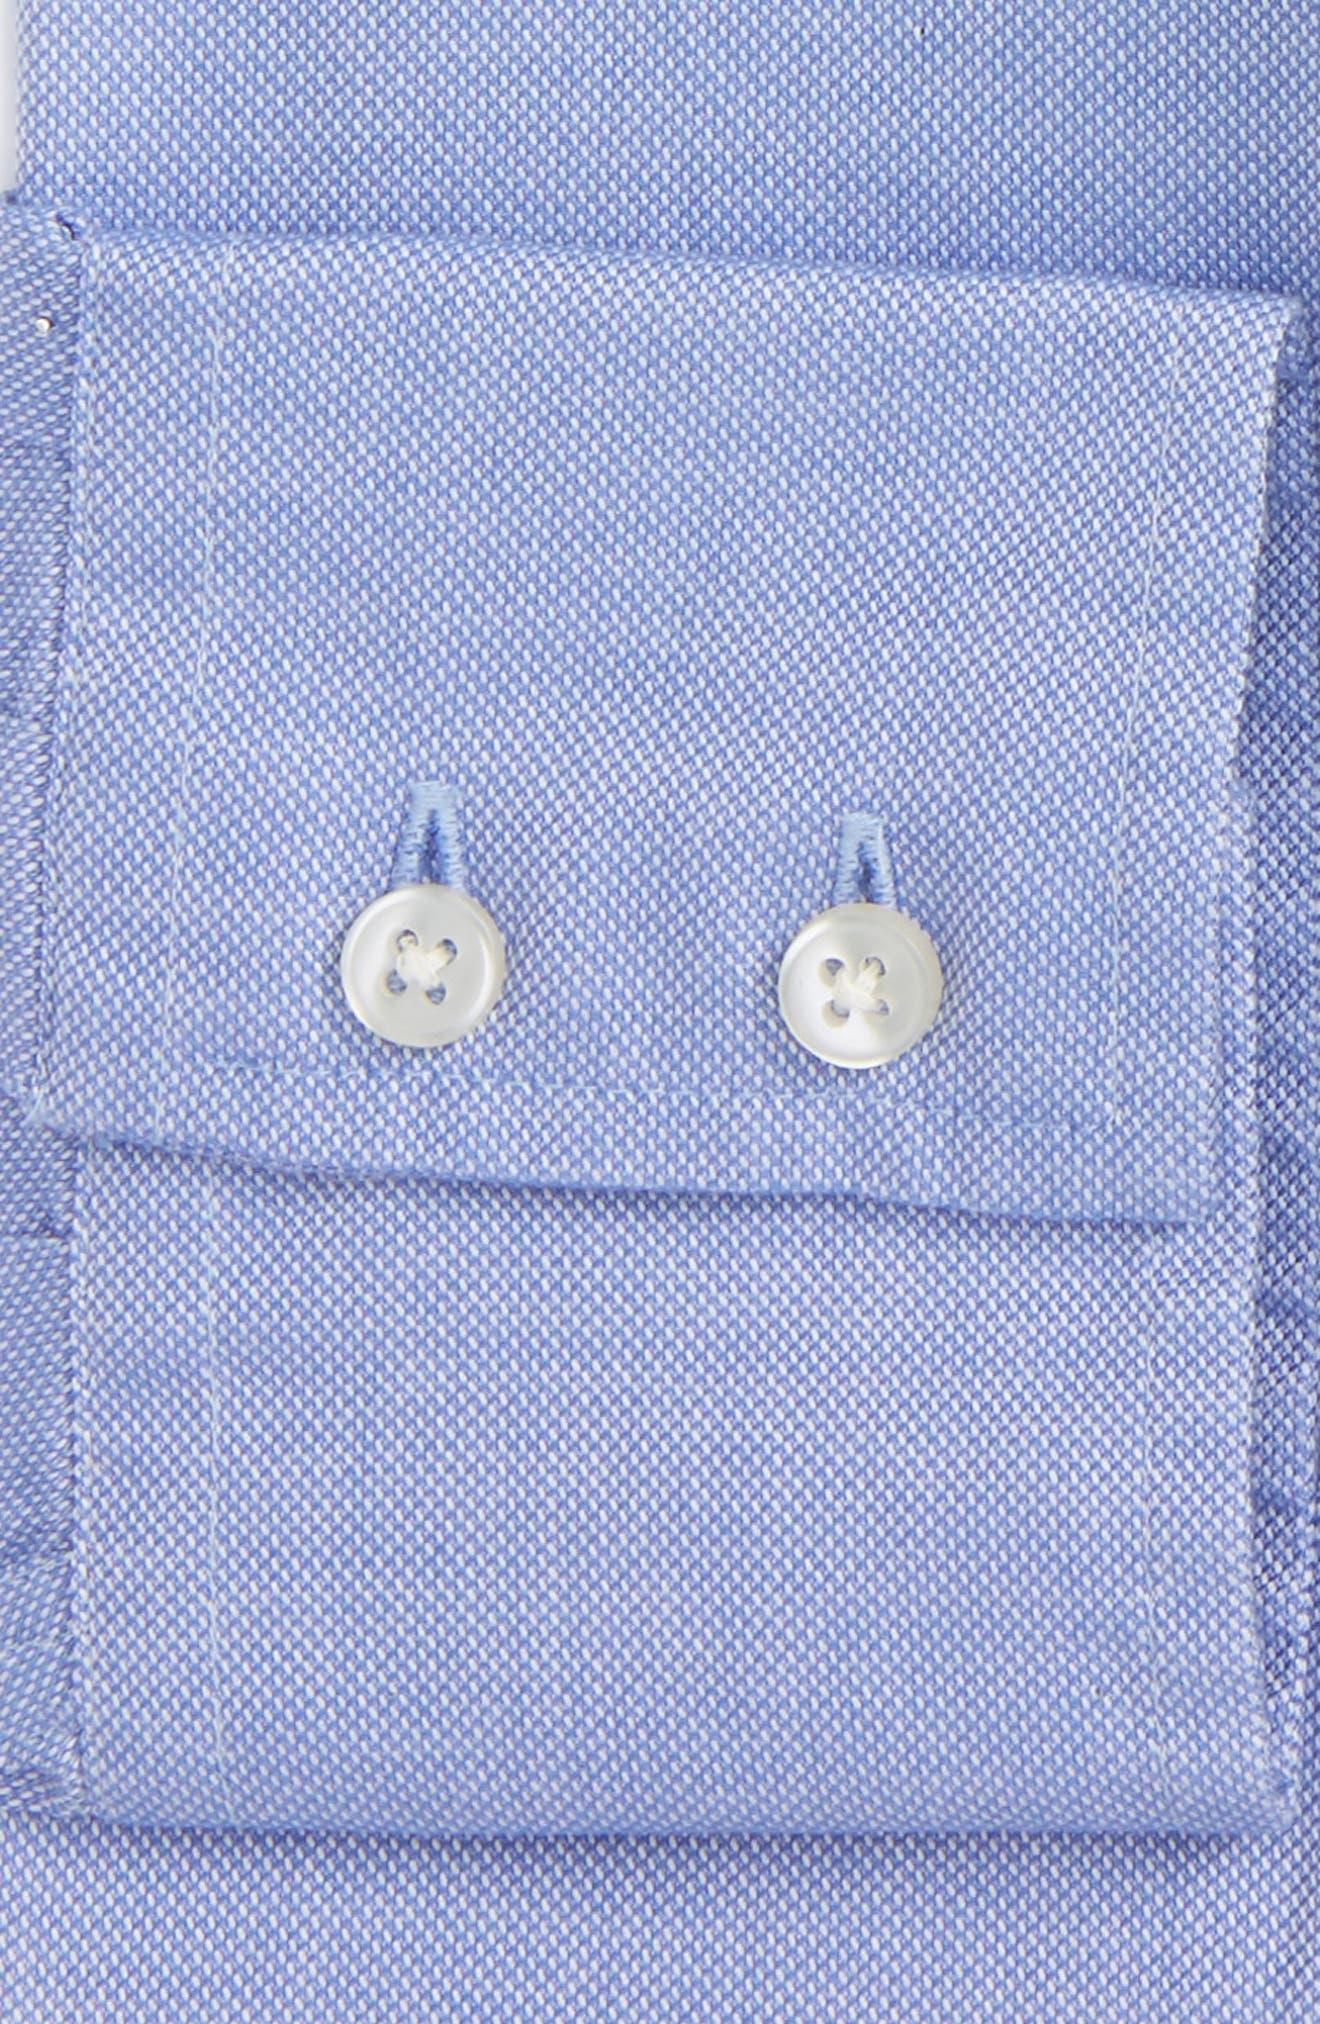 Trim Fit Oxford Dress Shirt,                             Alternate thumbnail 2, color,